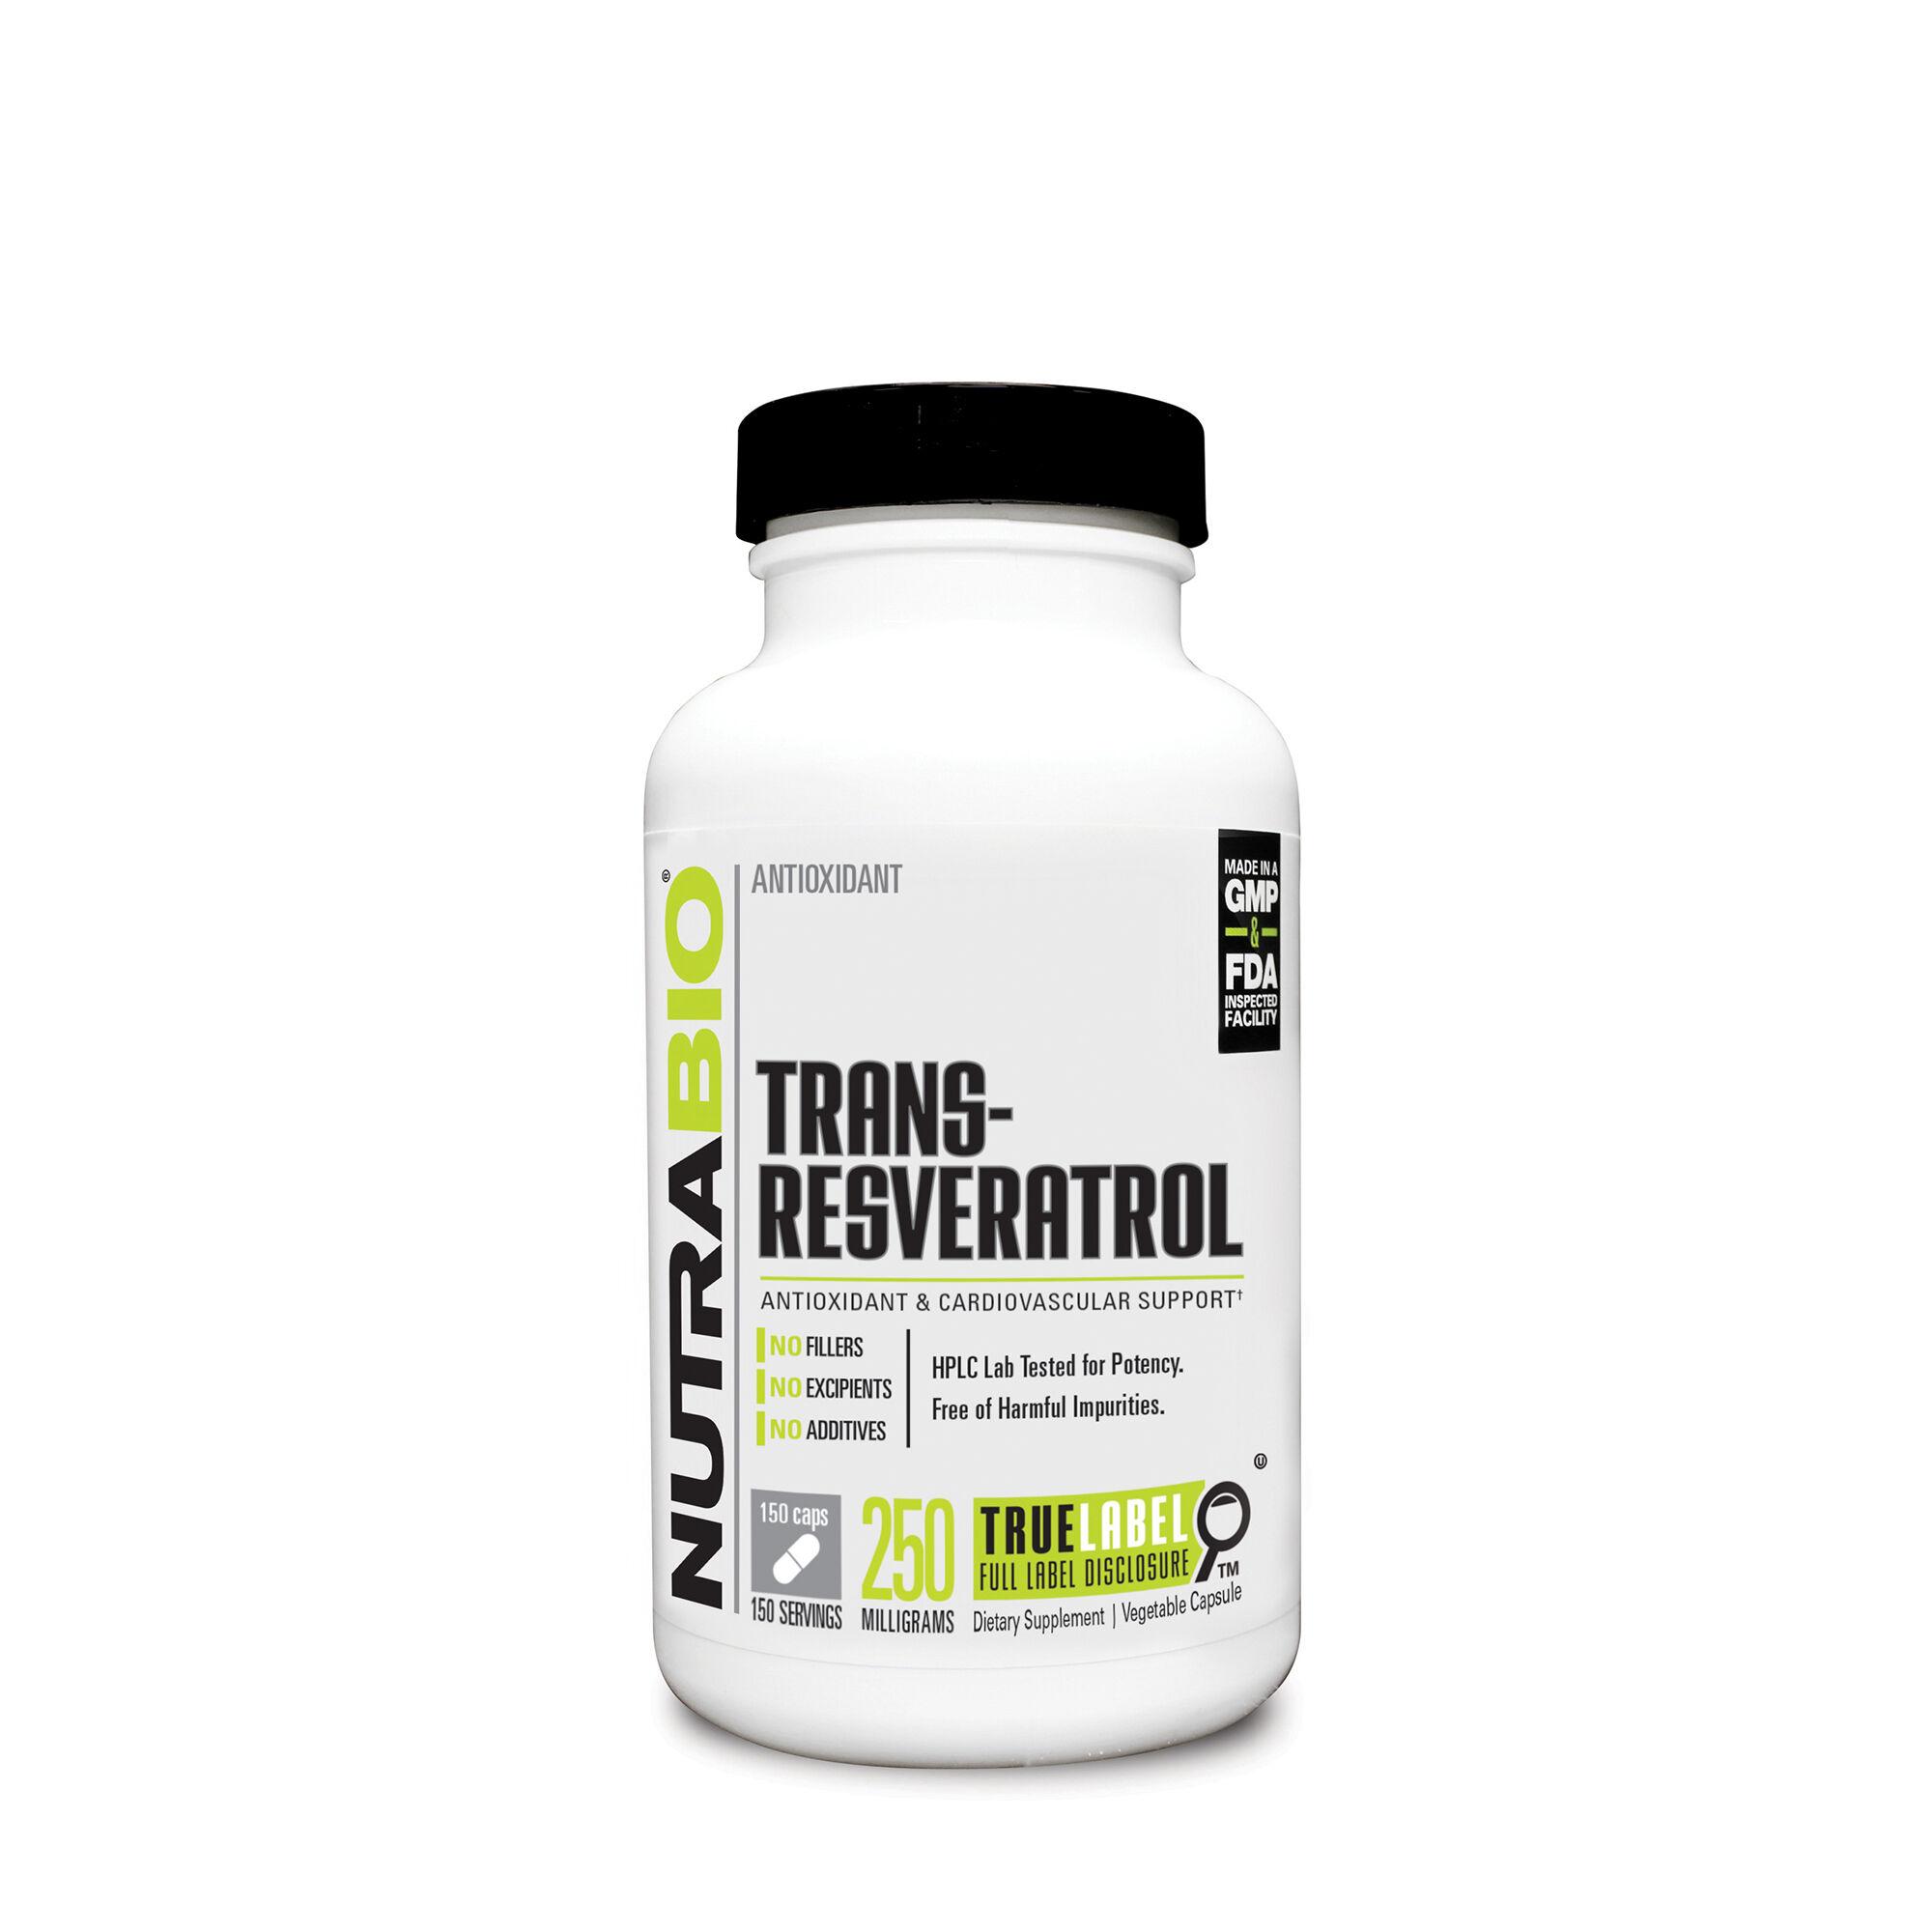 Nutrabio Trans Resveratrol Gnc